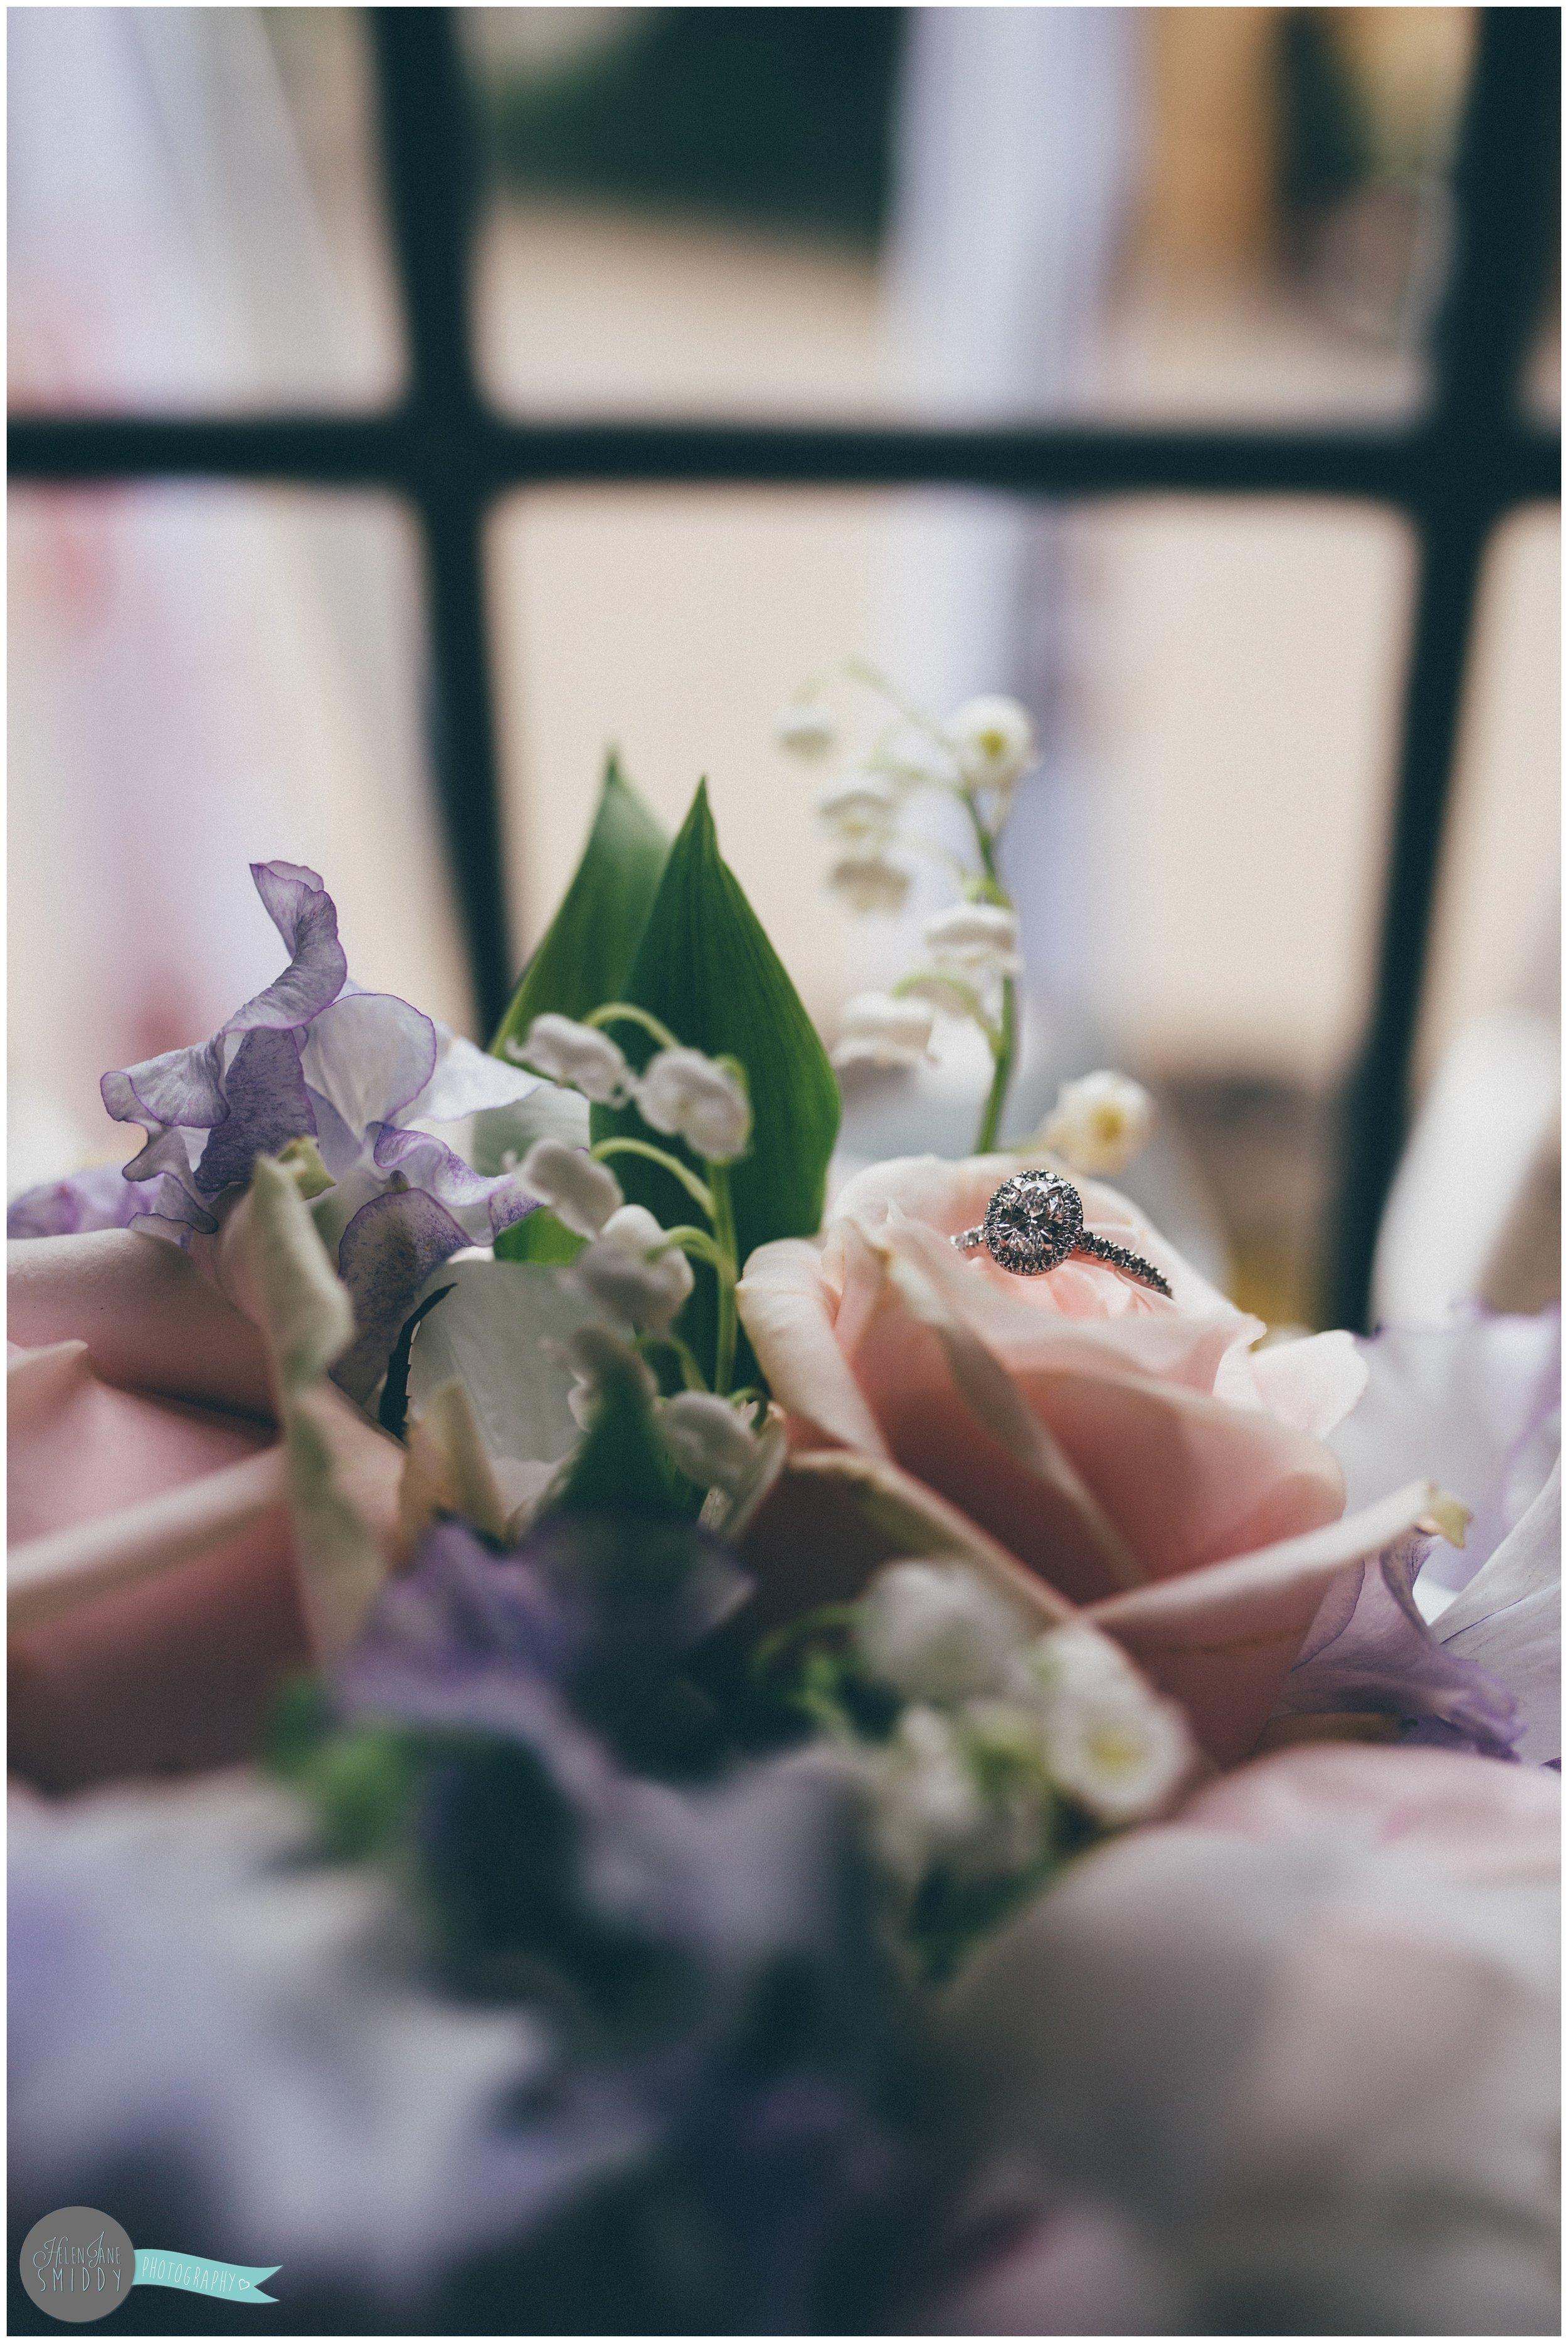 lemanoir-belmondlemanoir-belmondlemanoirauxquatsaisons-oxfordshire-oxfordshirewedding-weddingphotographer-cheshireweddingphotographer-cheshireweddingphotography-raymondblanc-fivestar-michelinstar-weddinghair-mac-macmakeup-emmabeaumontatelier-verawang-cartier-cartierwatch-boodles-boodlesanddunthorne-boodlesdiamond